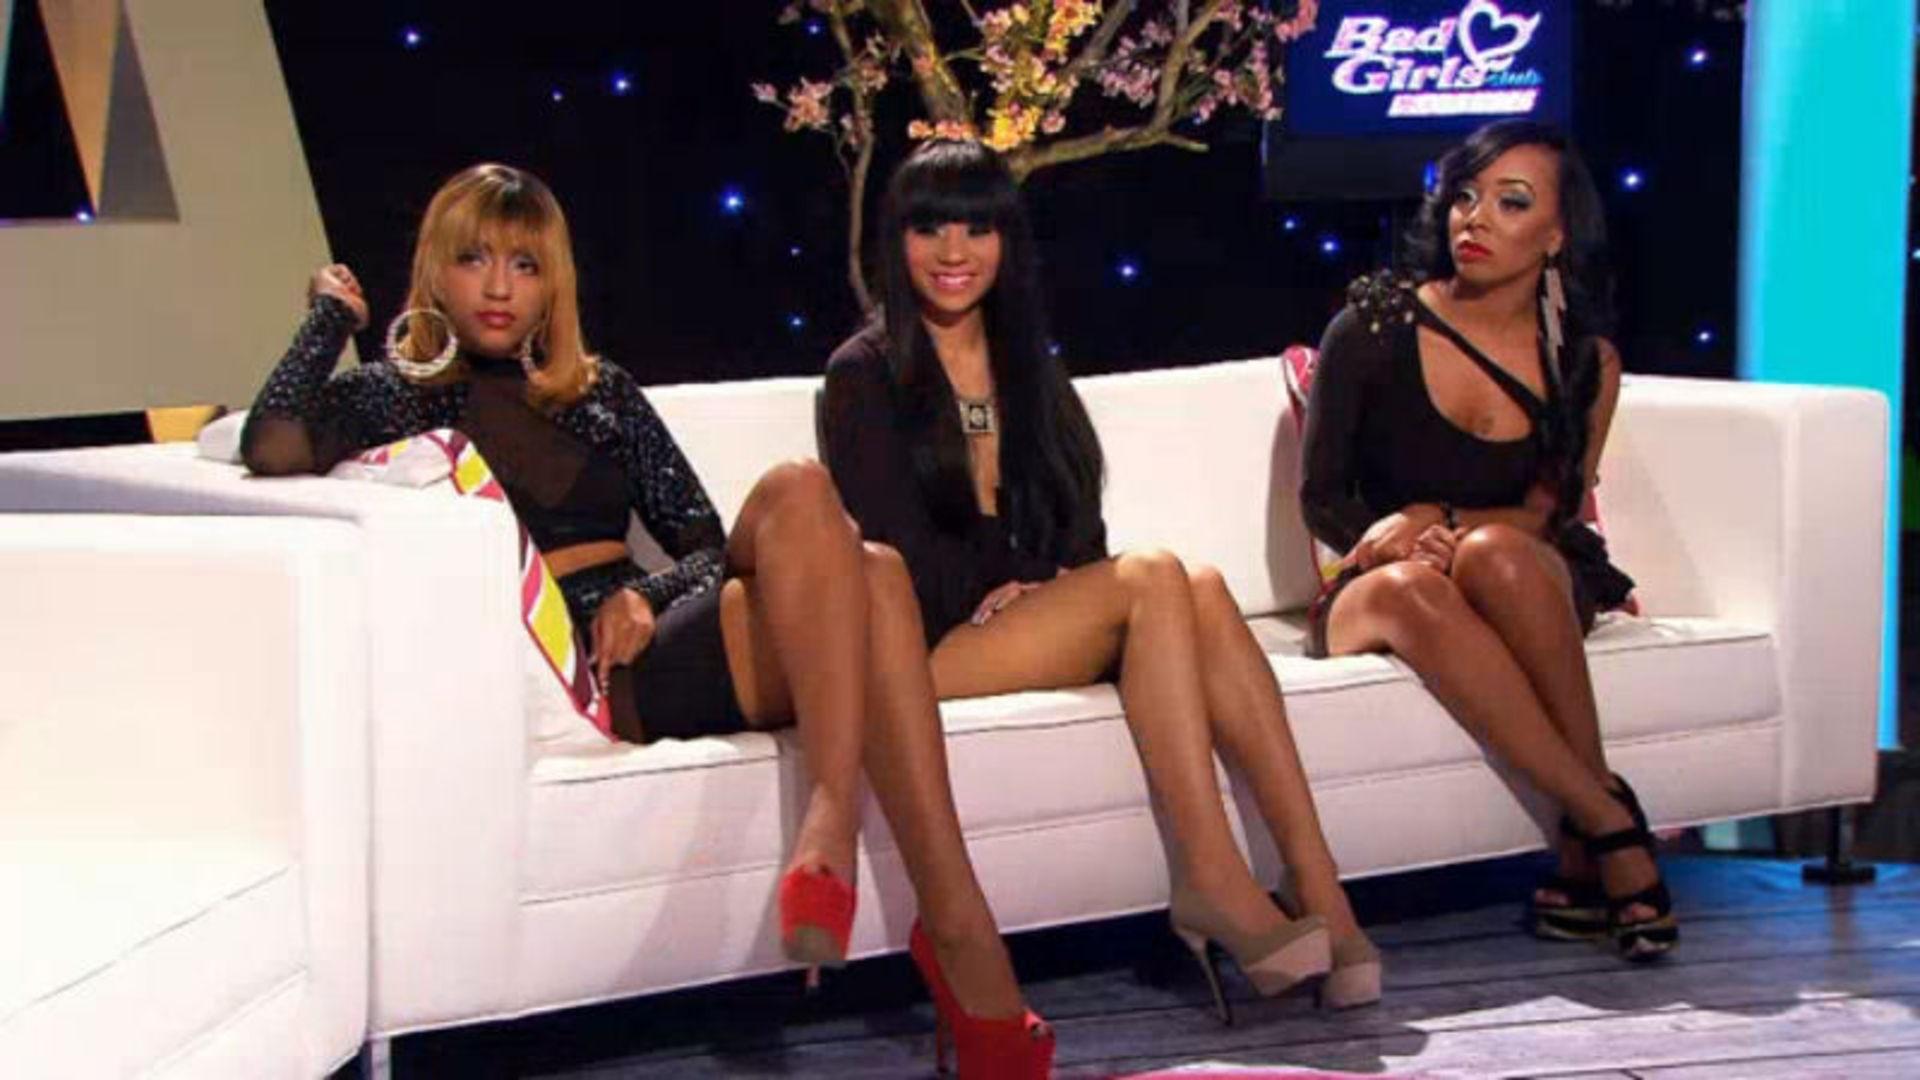 Bad Girls Club Reunion - Part 2